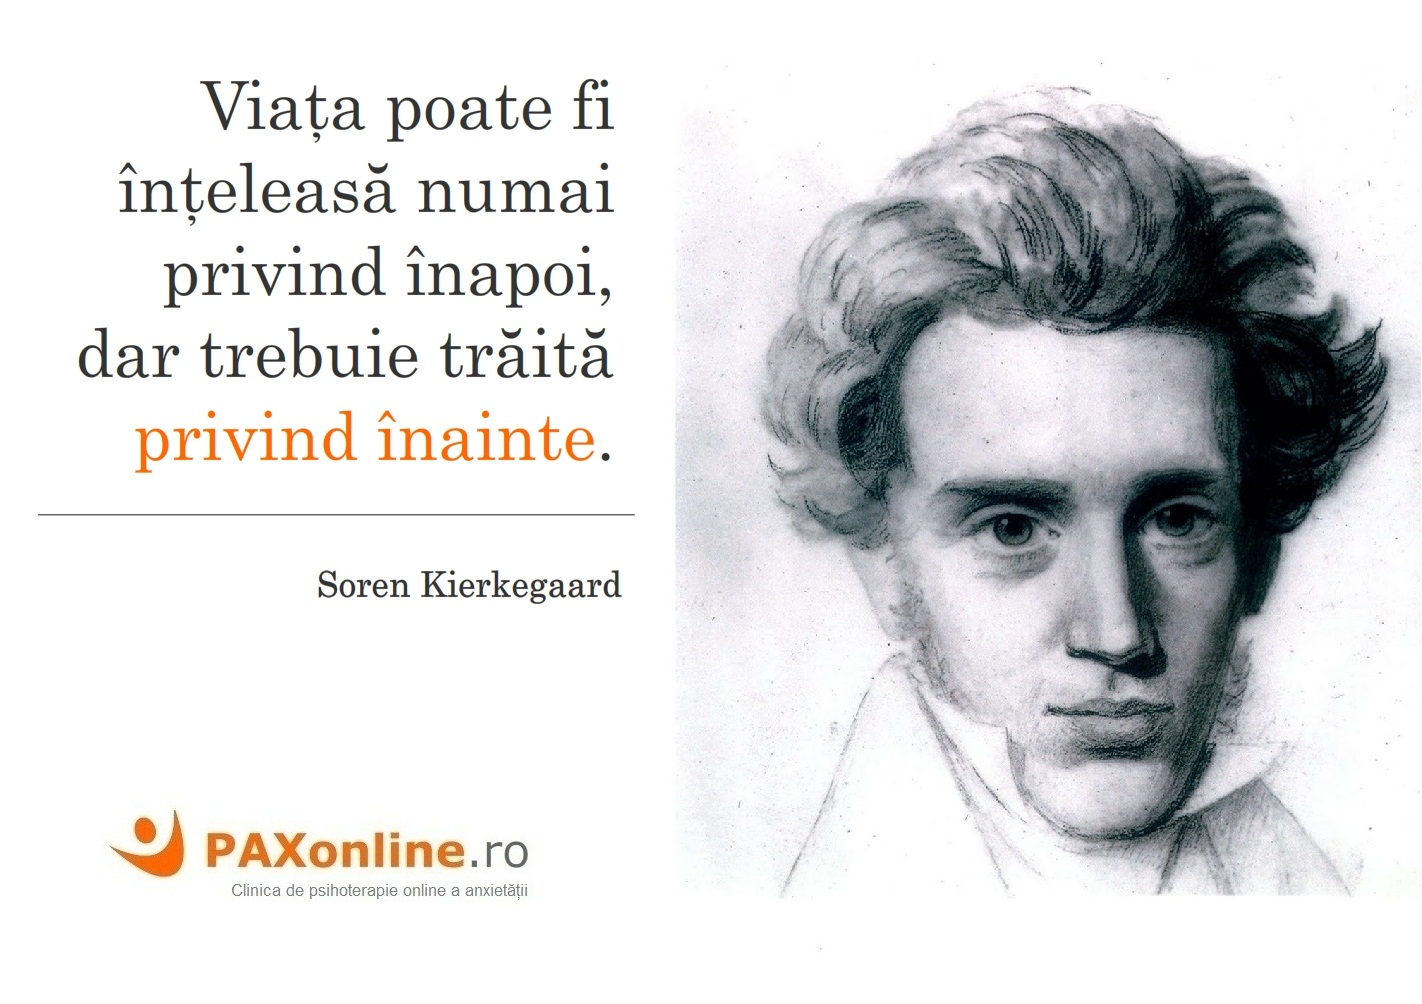 Citat Kierkegaard